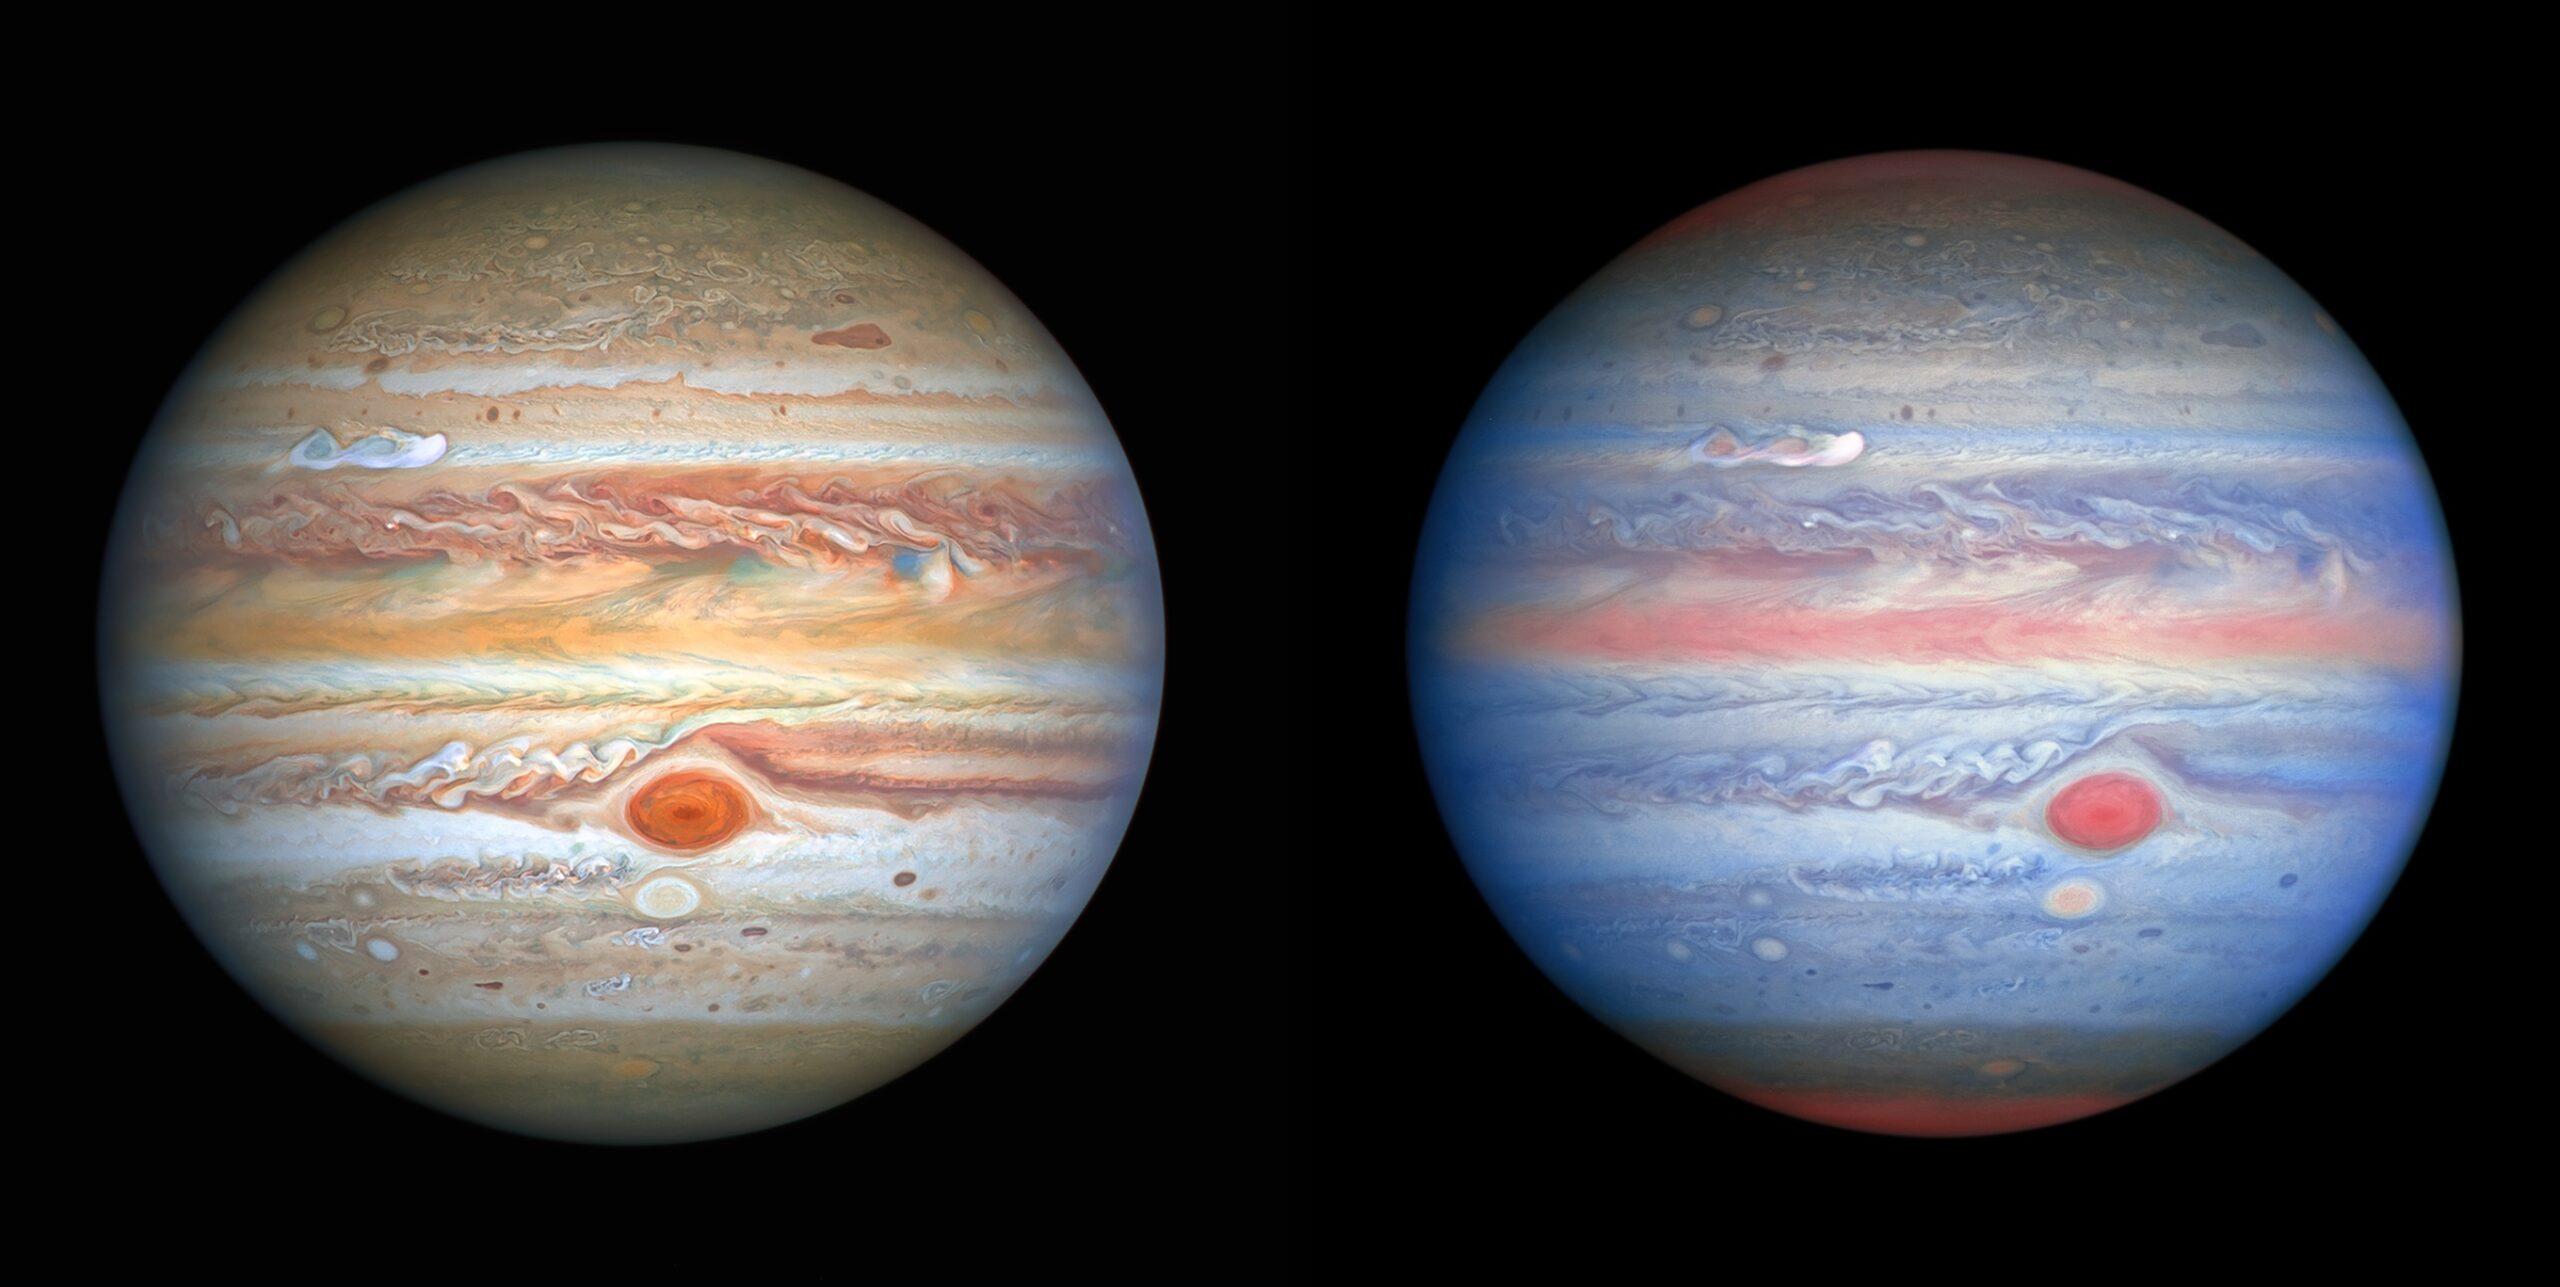 Hubble Views of Jupiter